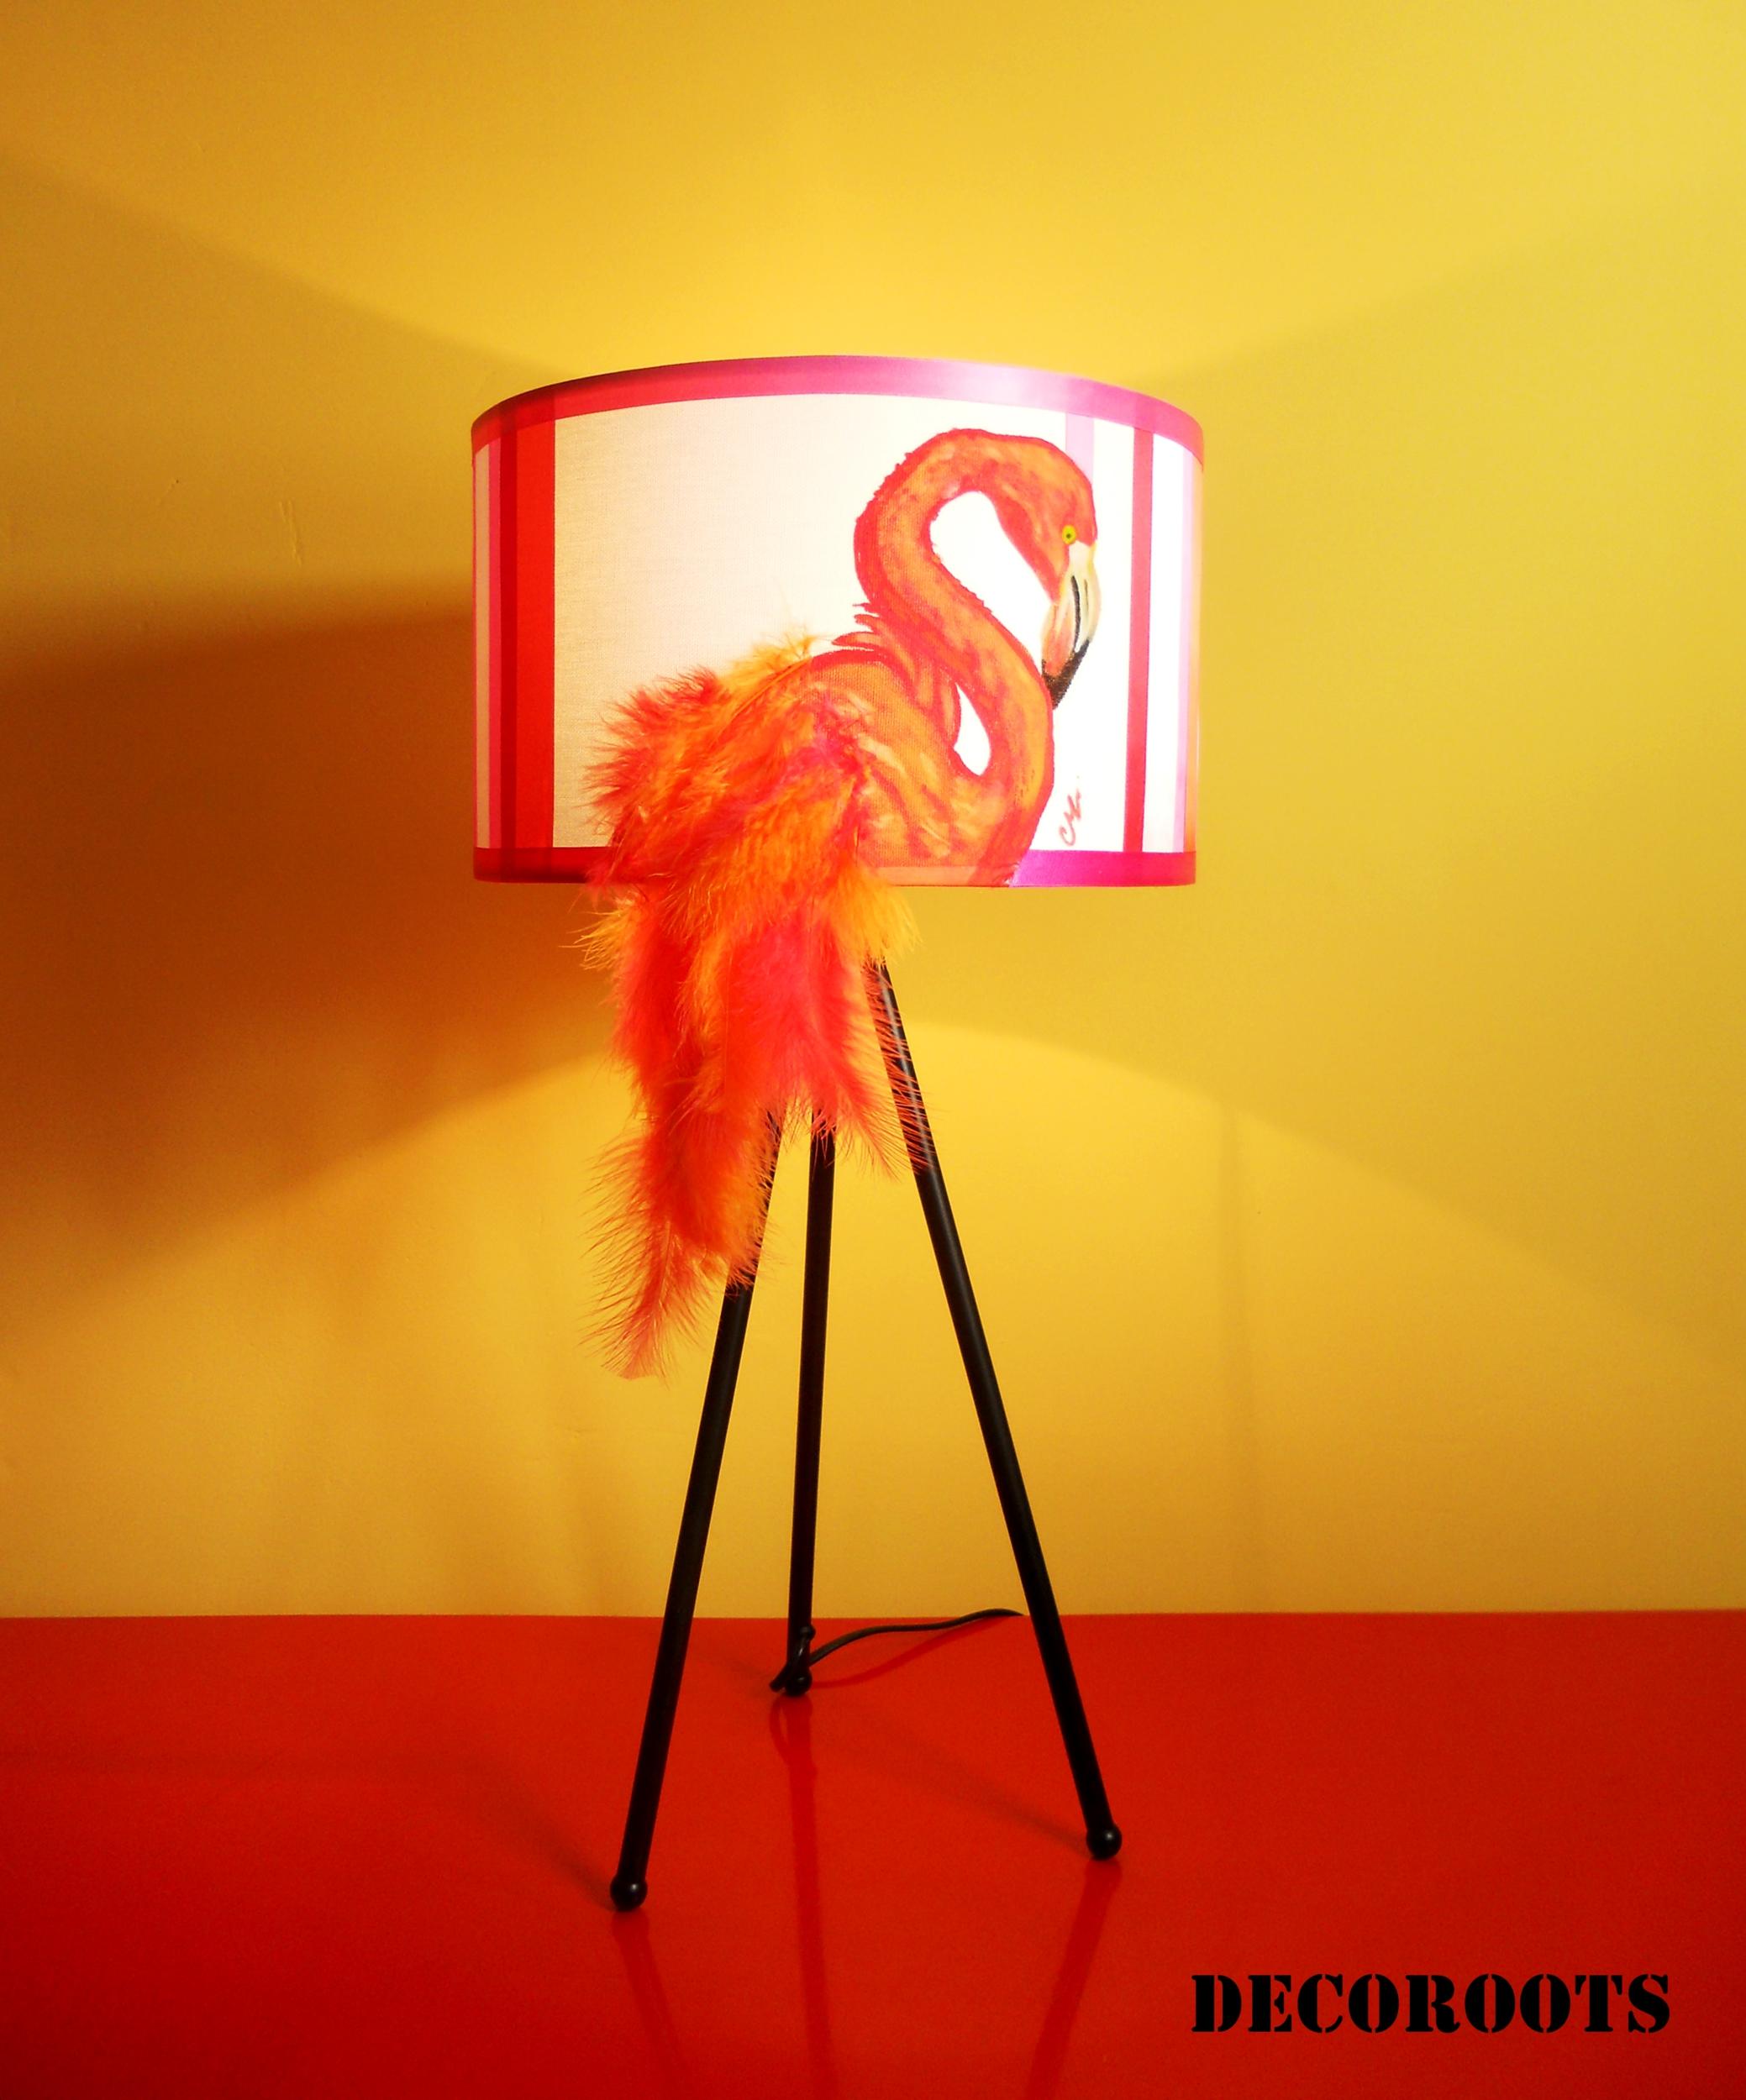 lampe design flamant rose art design contemporain luminaire et objet design decoroots. Black Bedroom Furniture Sets. Home Design Ideas